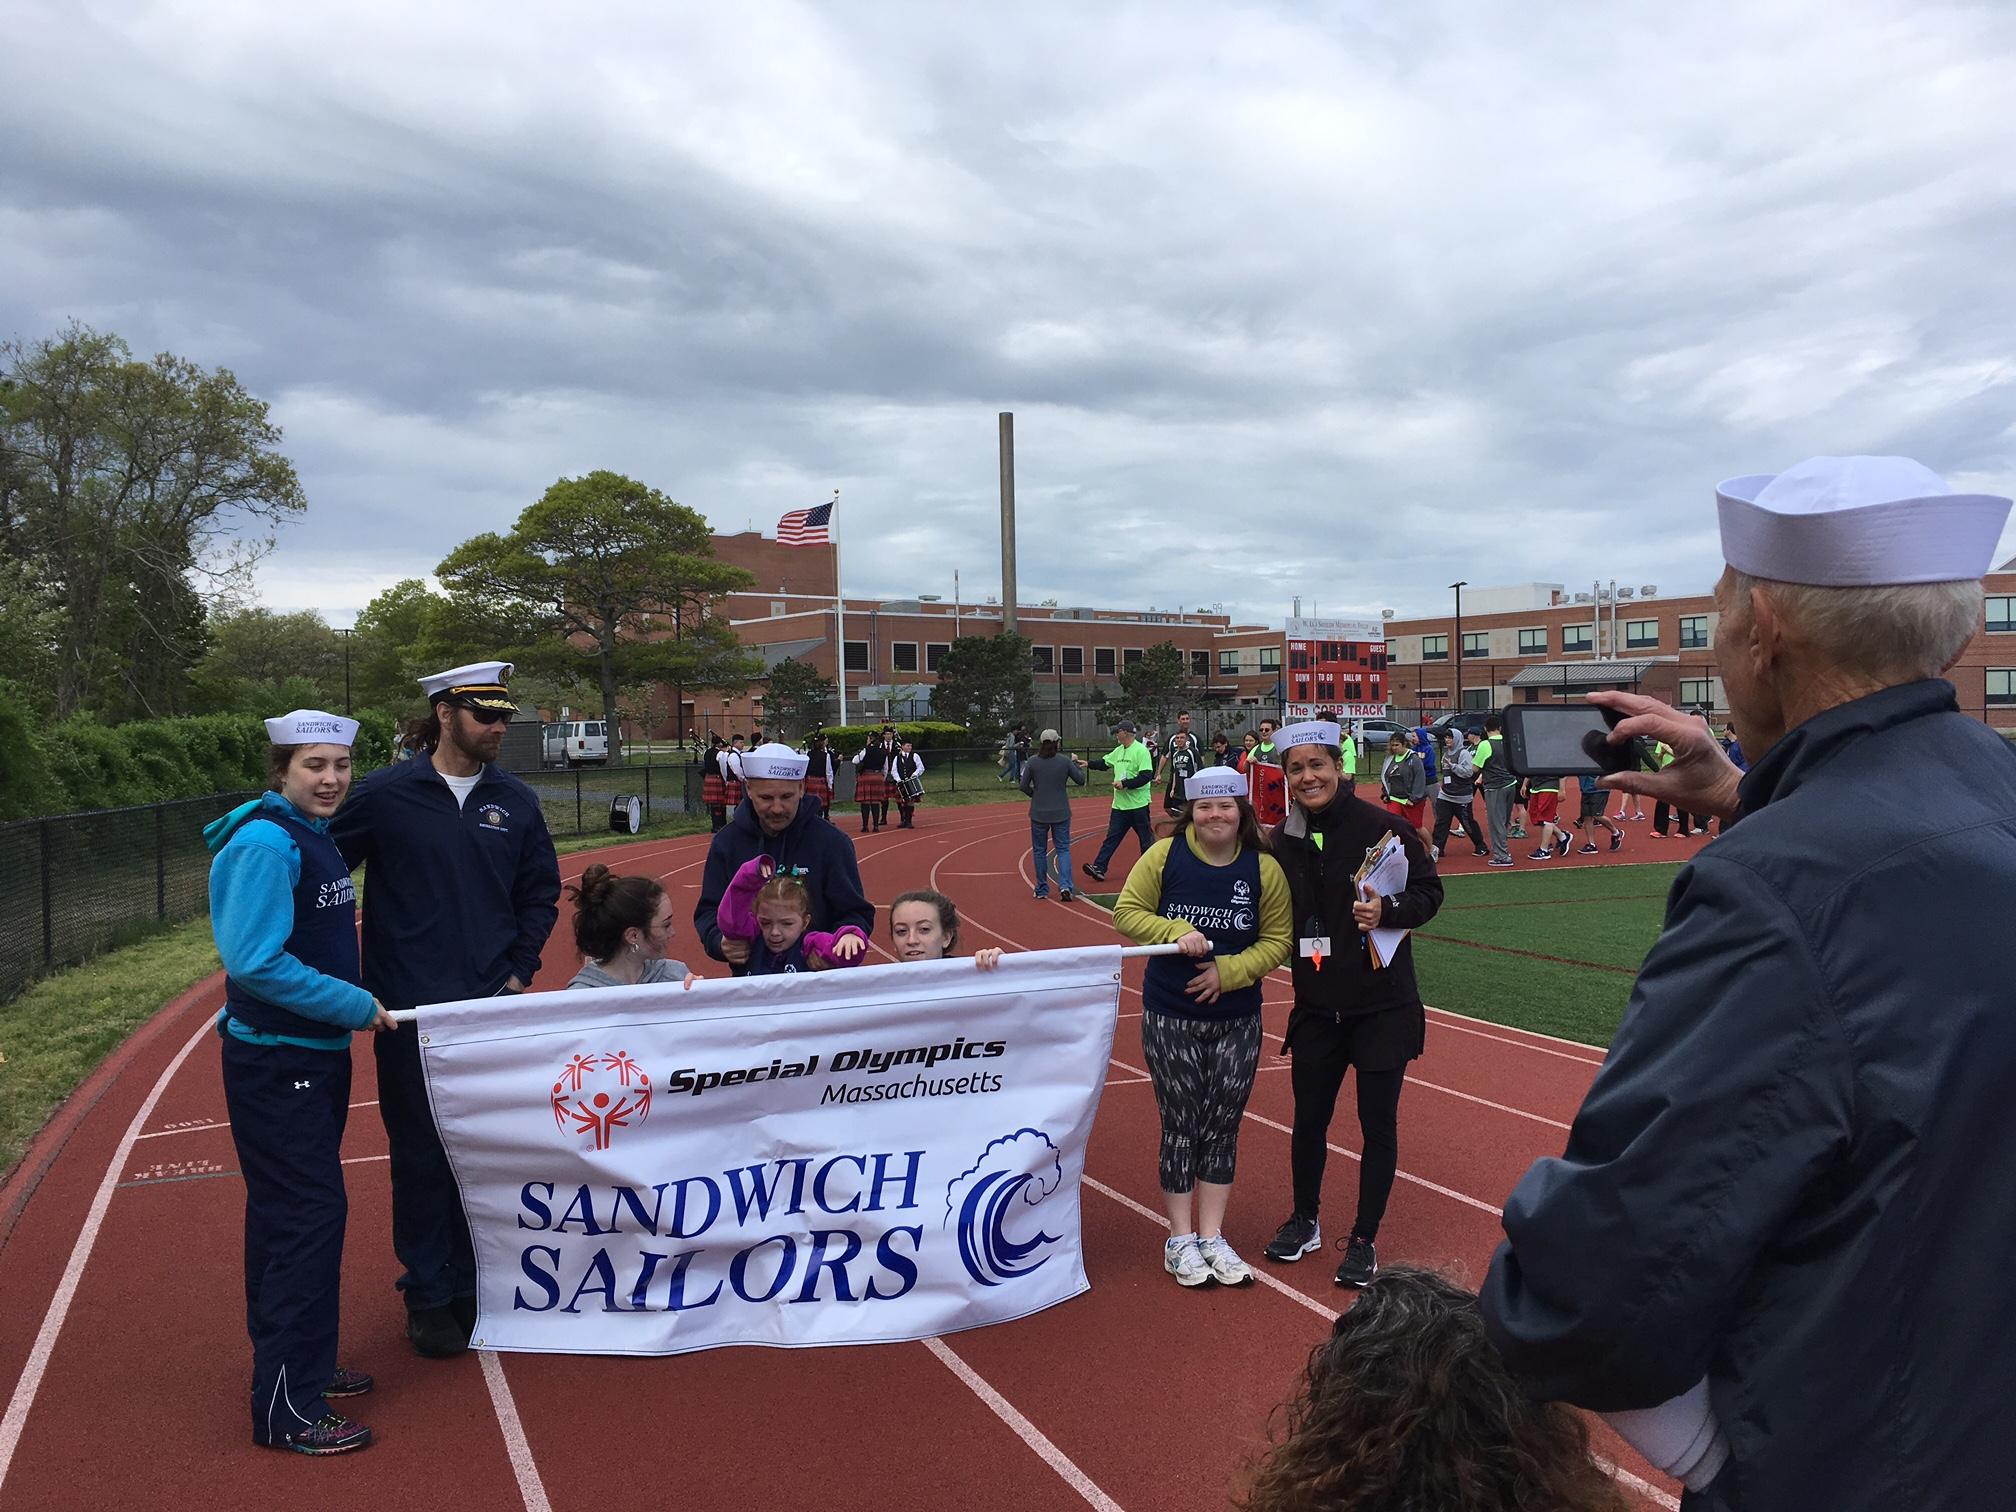 Sandwich Sailors Team photo